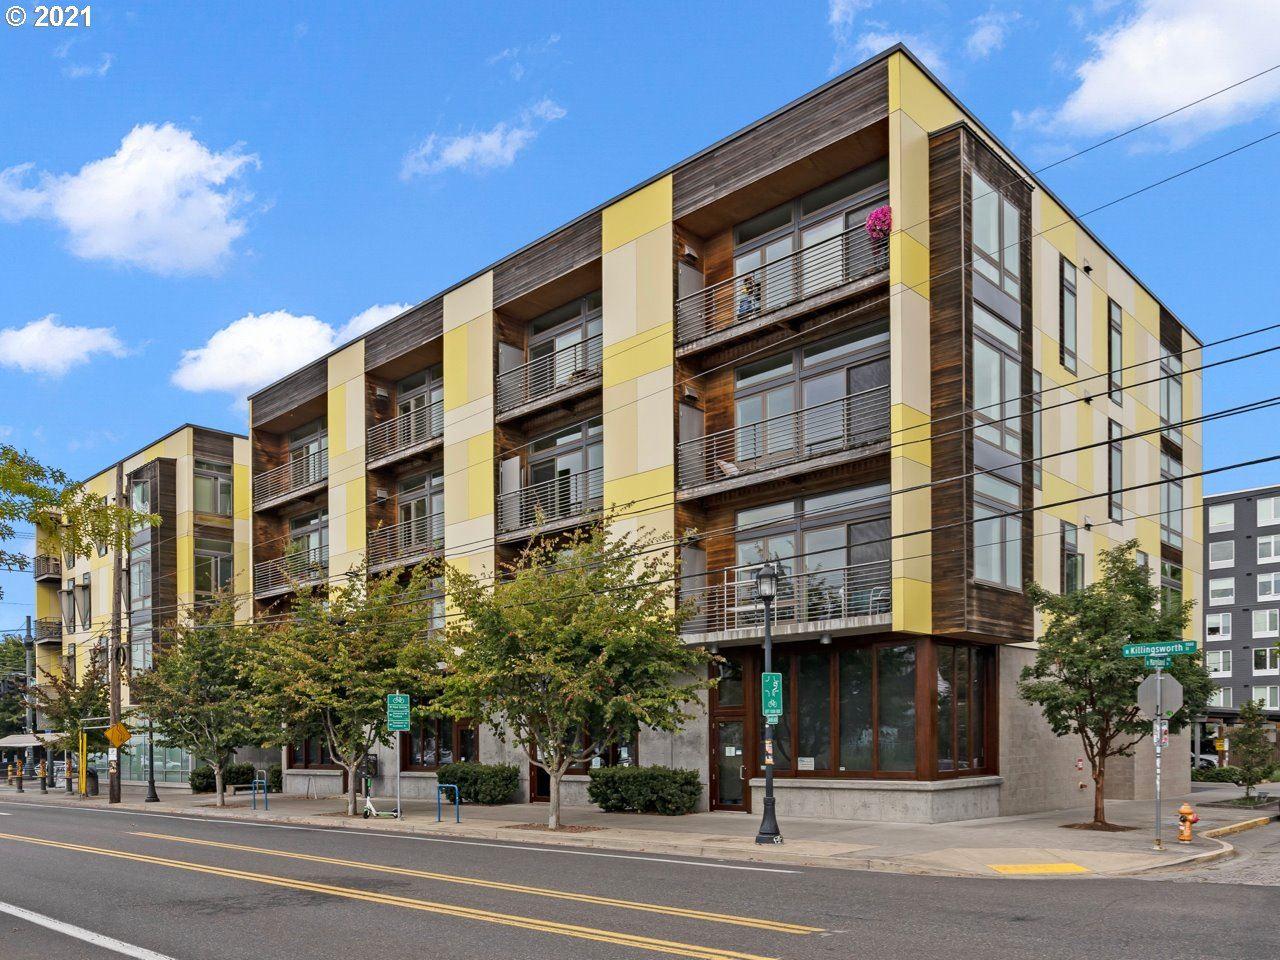 1455 N KILLINGSWORTH ST #403, Portland, OR 97217 - MLS#: 21358331